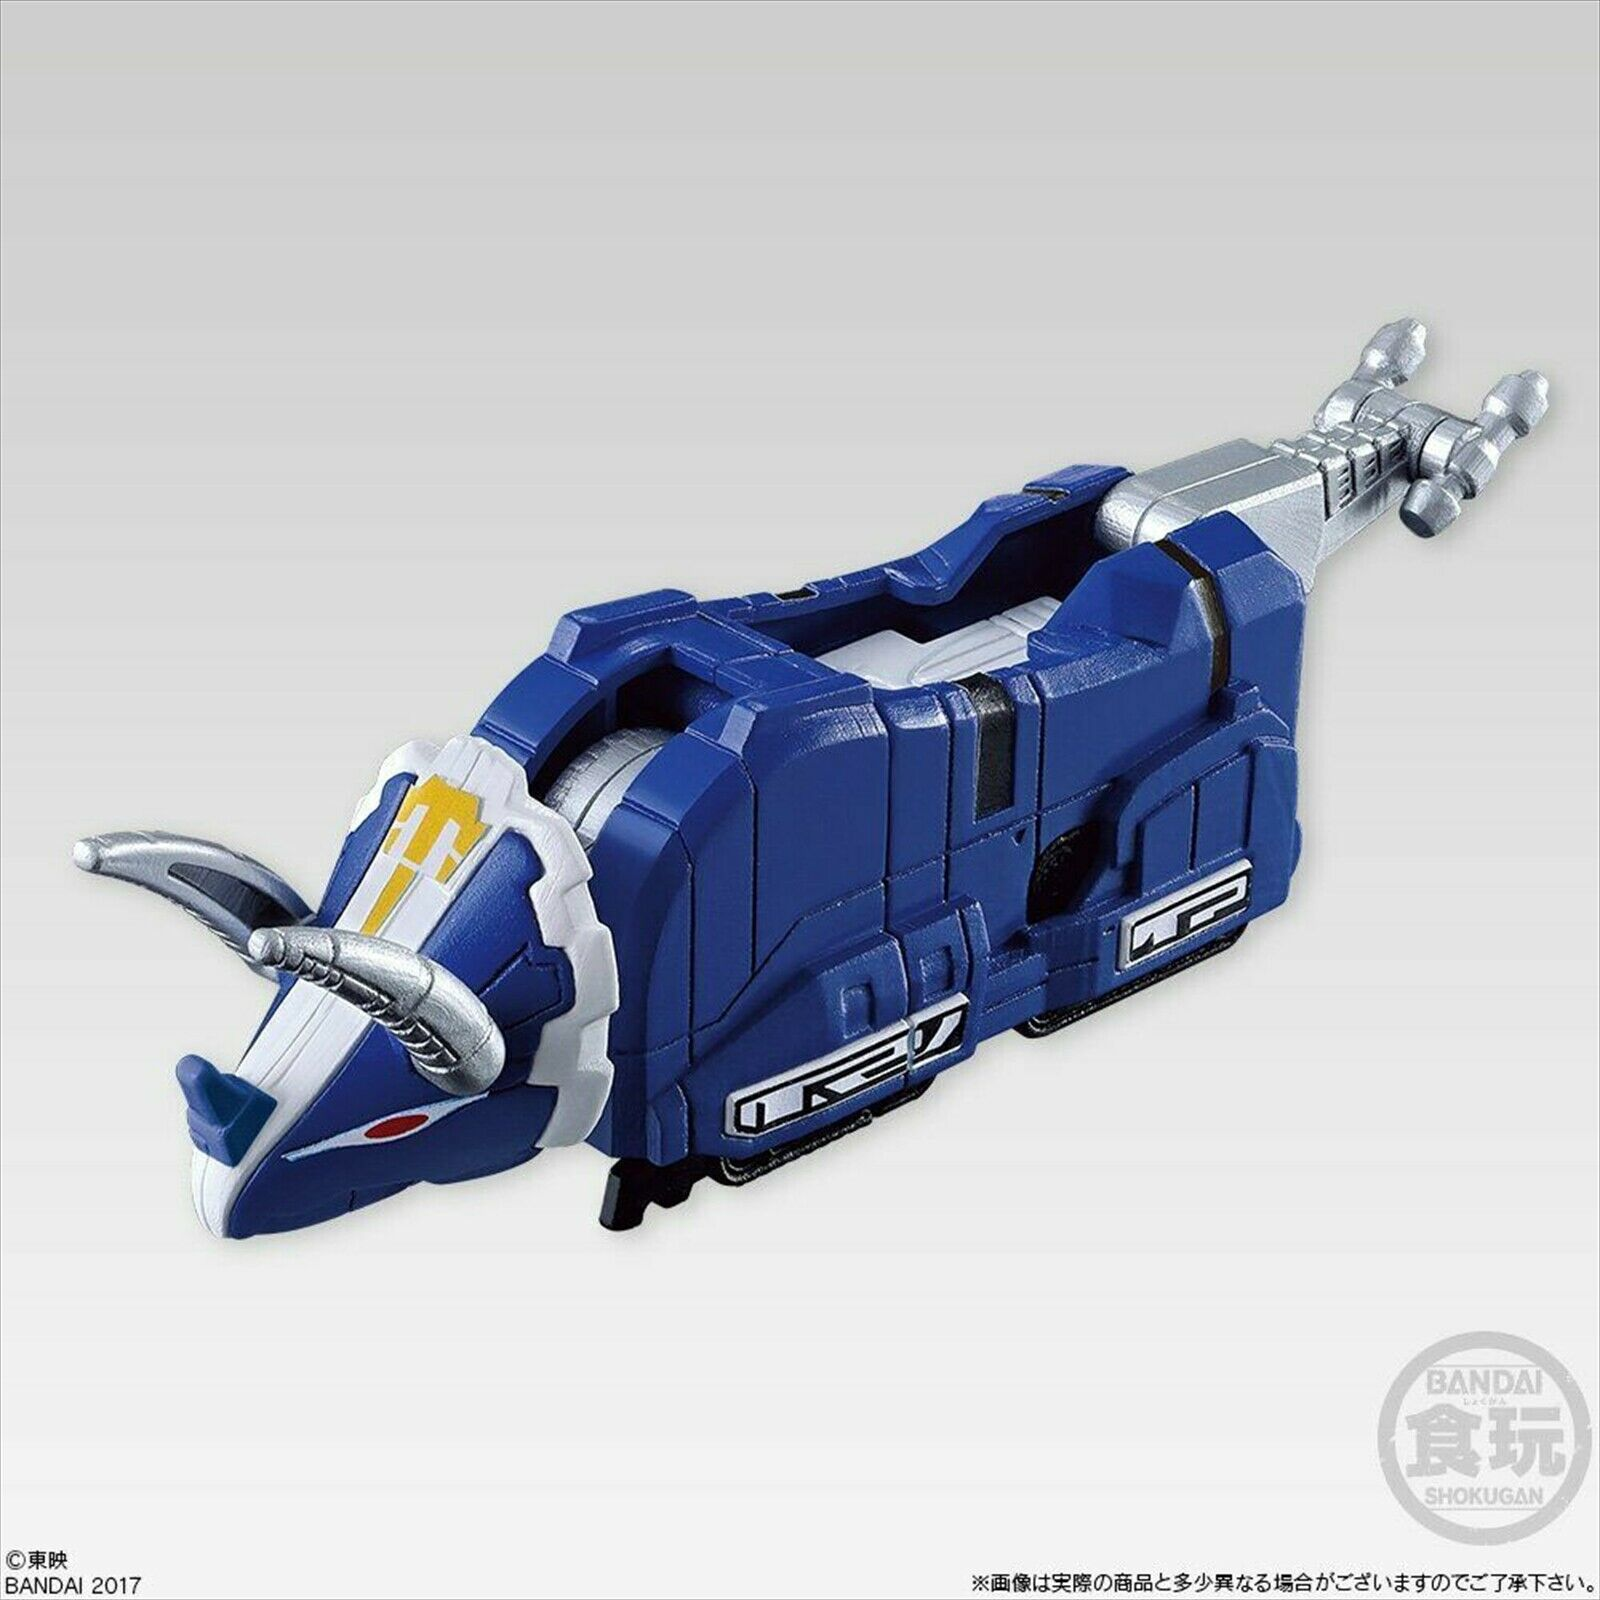 Super Minipla Megazord Daizyujin Zyuranger Mighty Morphin Legacy MODEL KIT